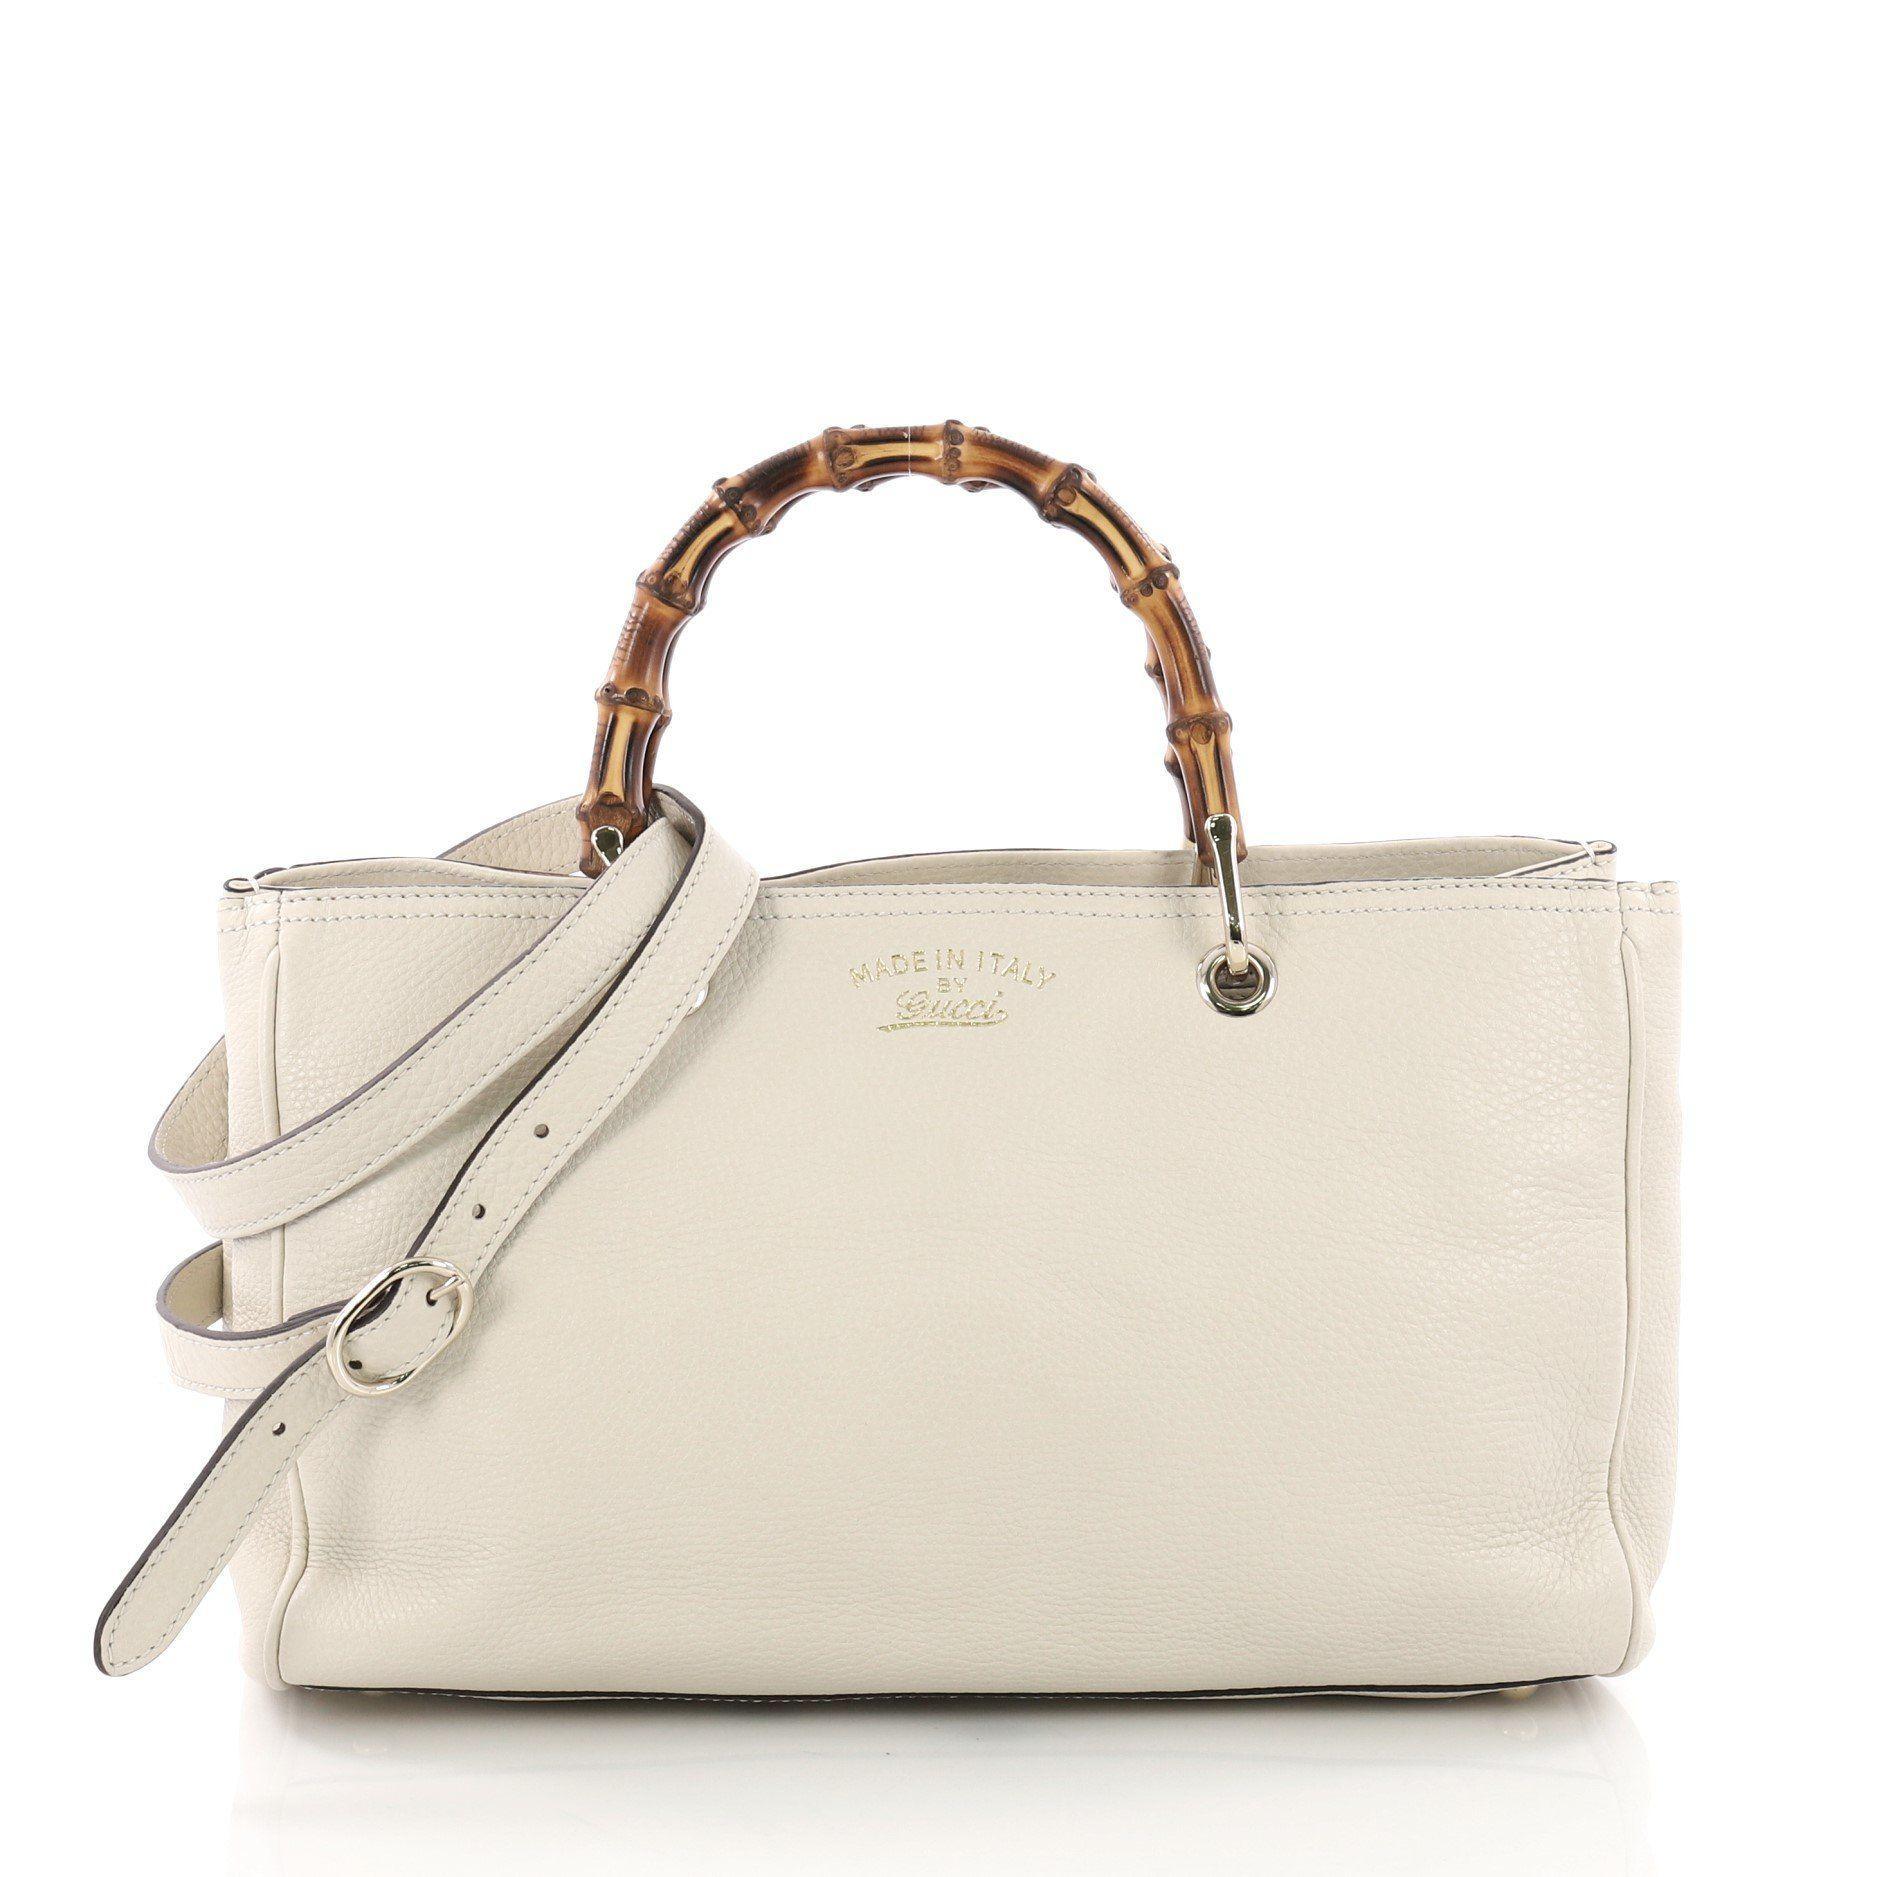 4e86a7d28c1e Lyst - Gucci Pre Owned Bamboo Shopper Tote Leather Medium in Natural